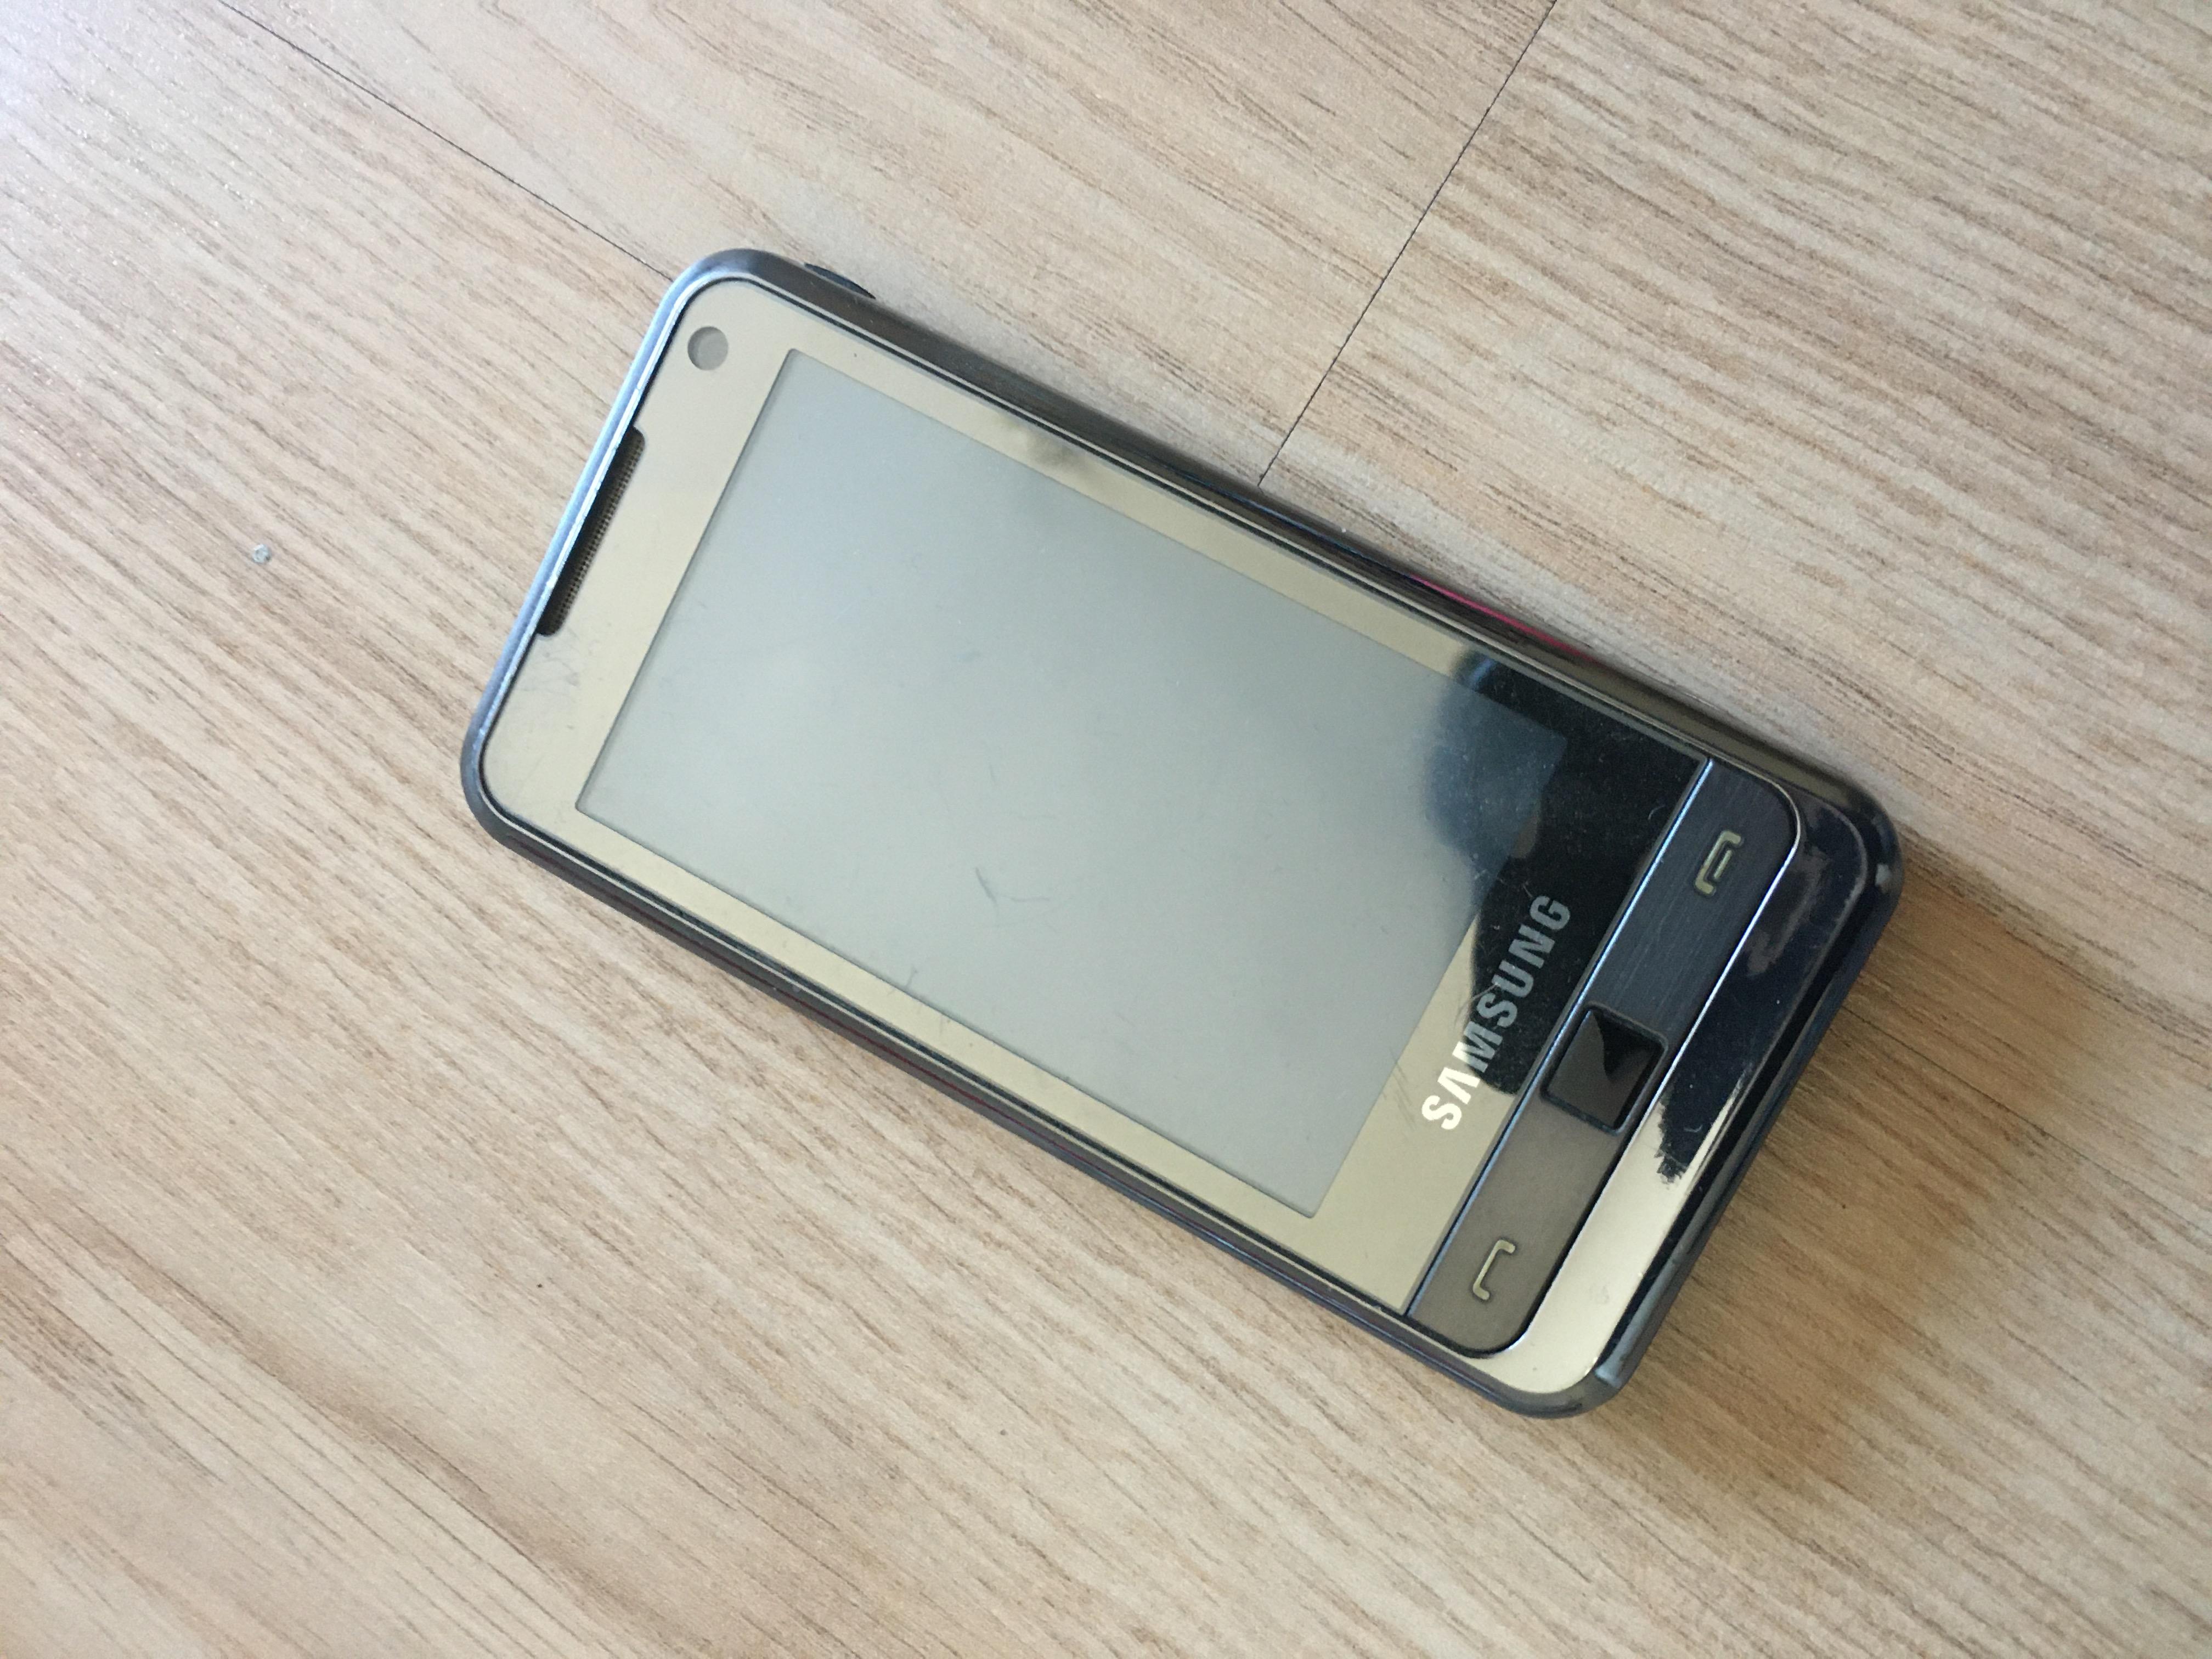 Samsung Tuşlu Dokunmatik Cep Telefonu